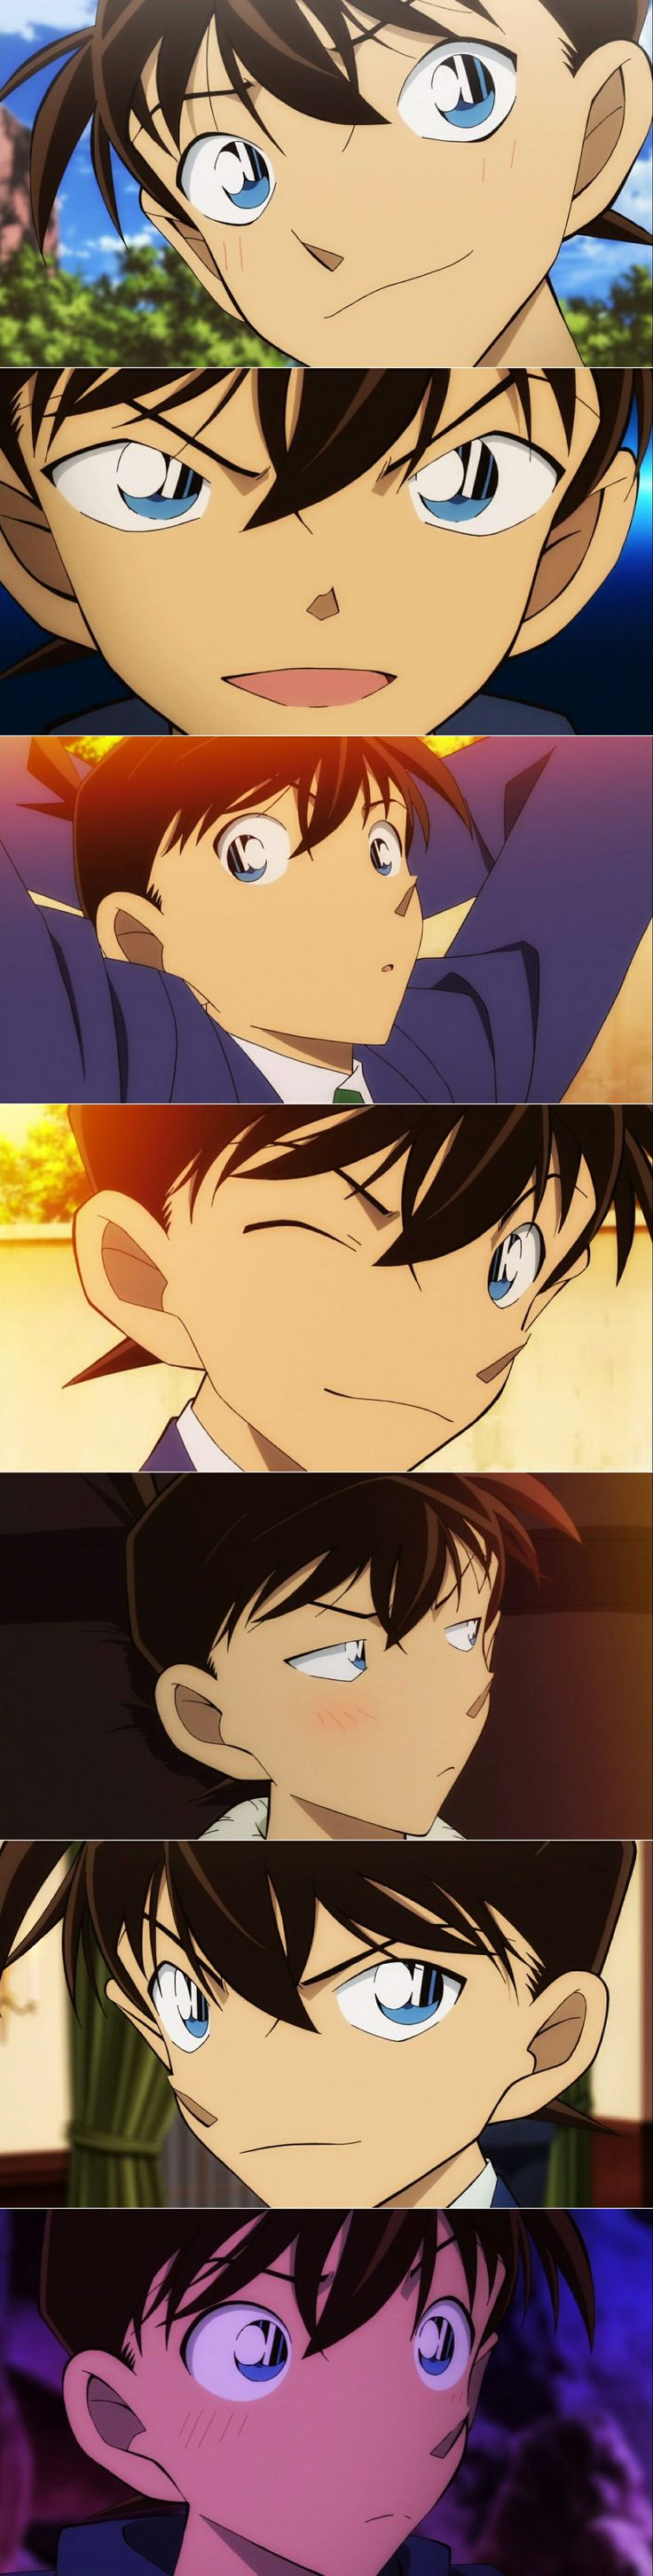 ♥@Charming♥: Best of Shinichi ;)